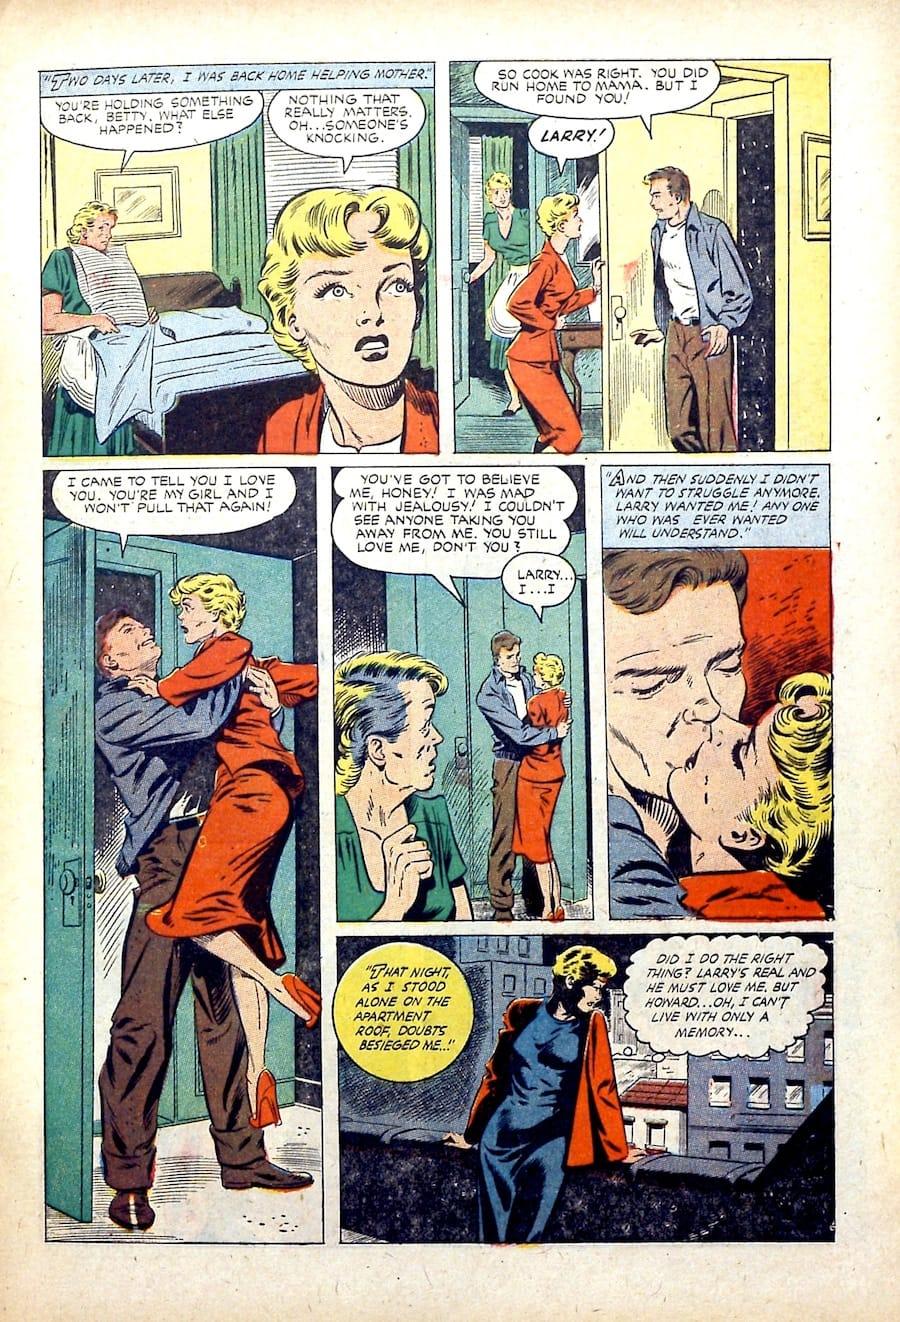 Matt Baker st.john golden age 1950s romance comic book page art  - Cinderella Love v2 #14